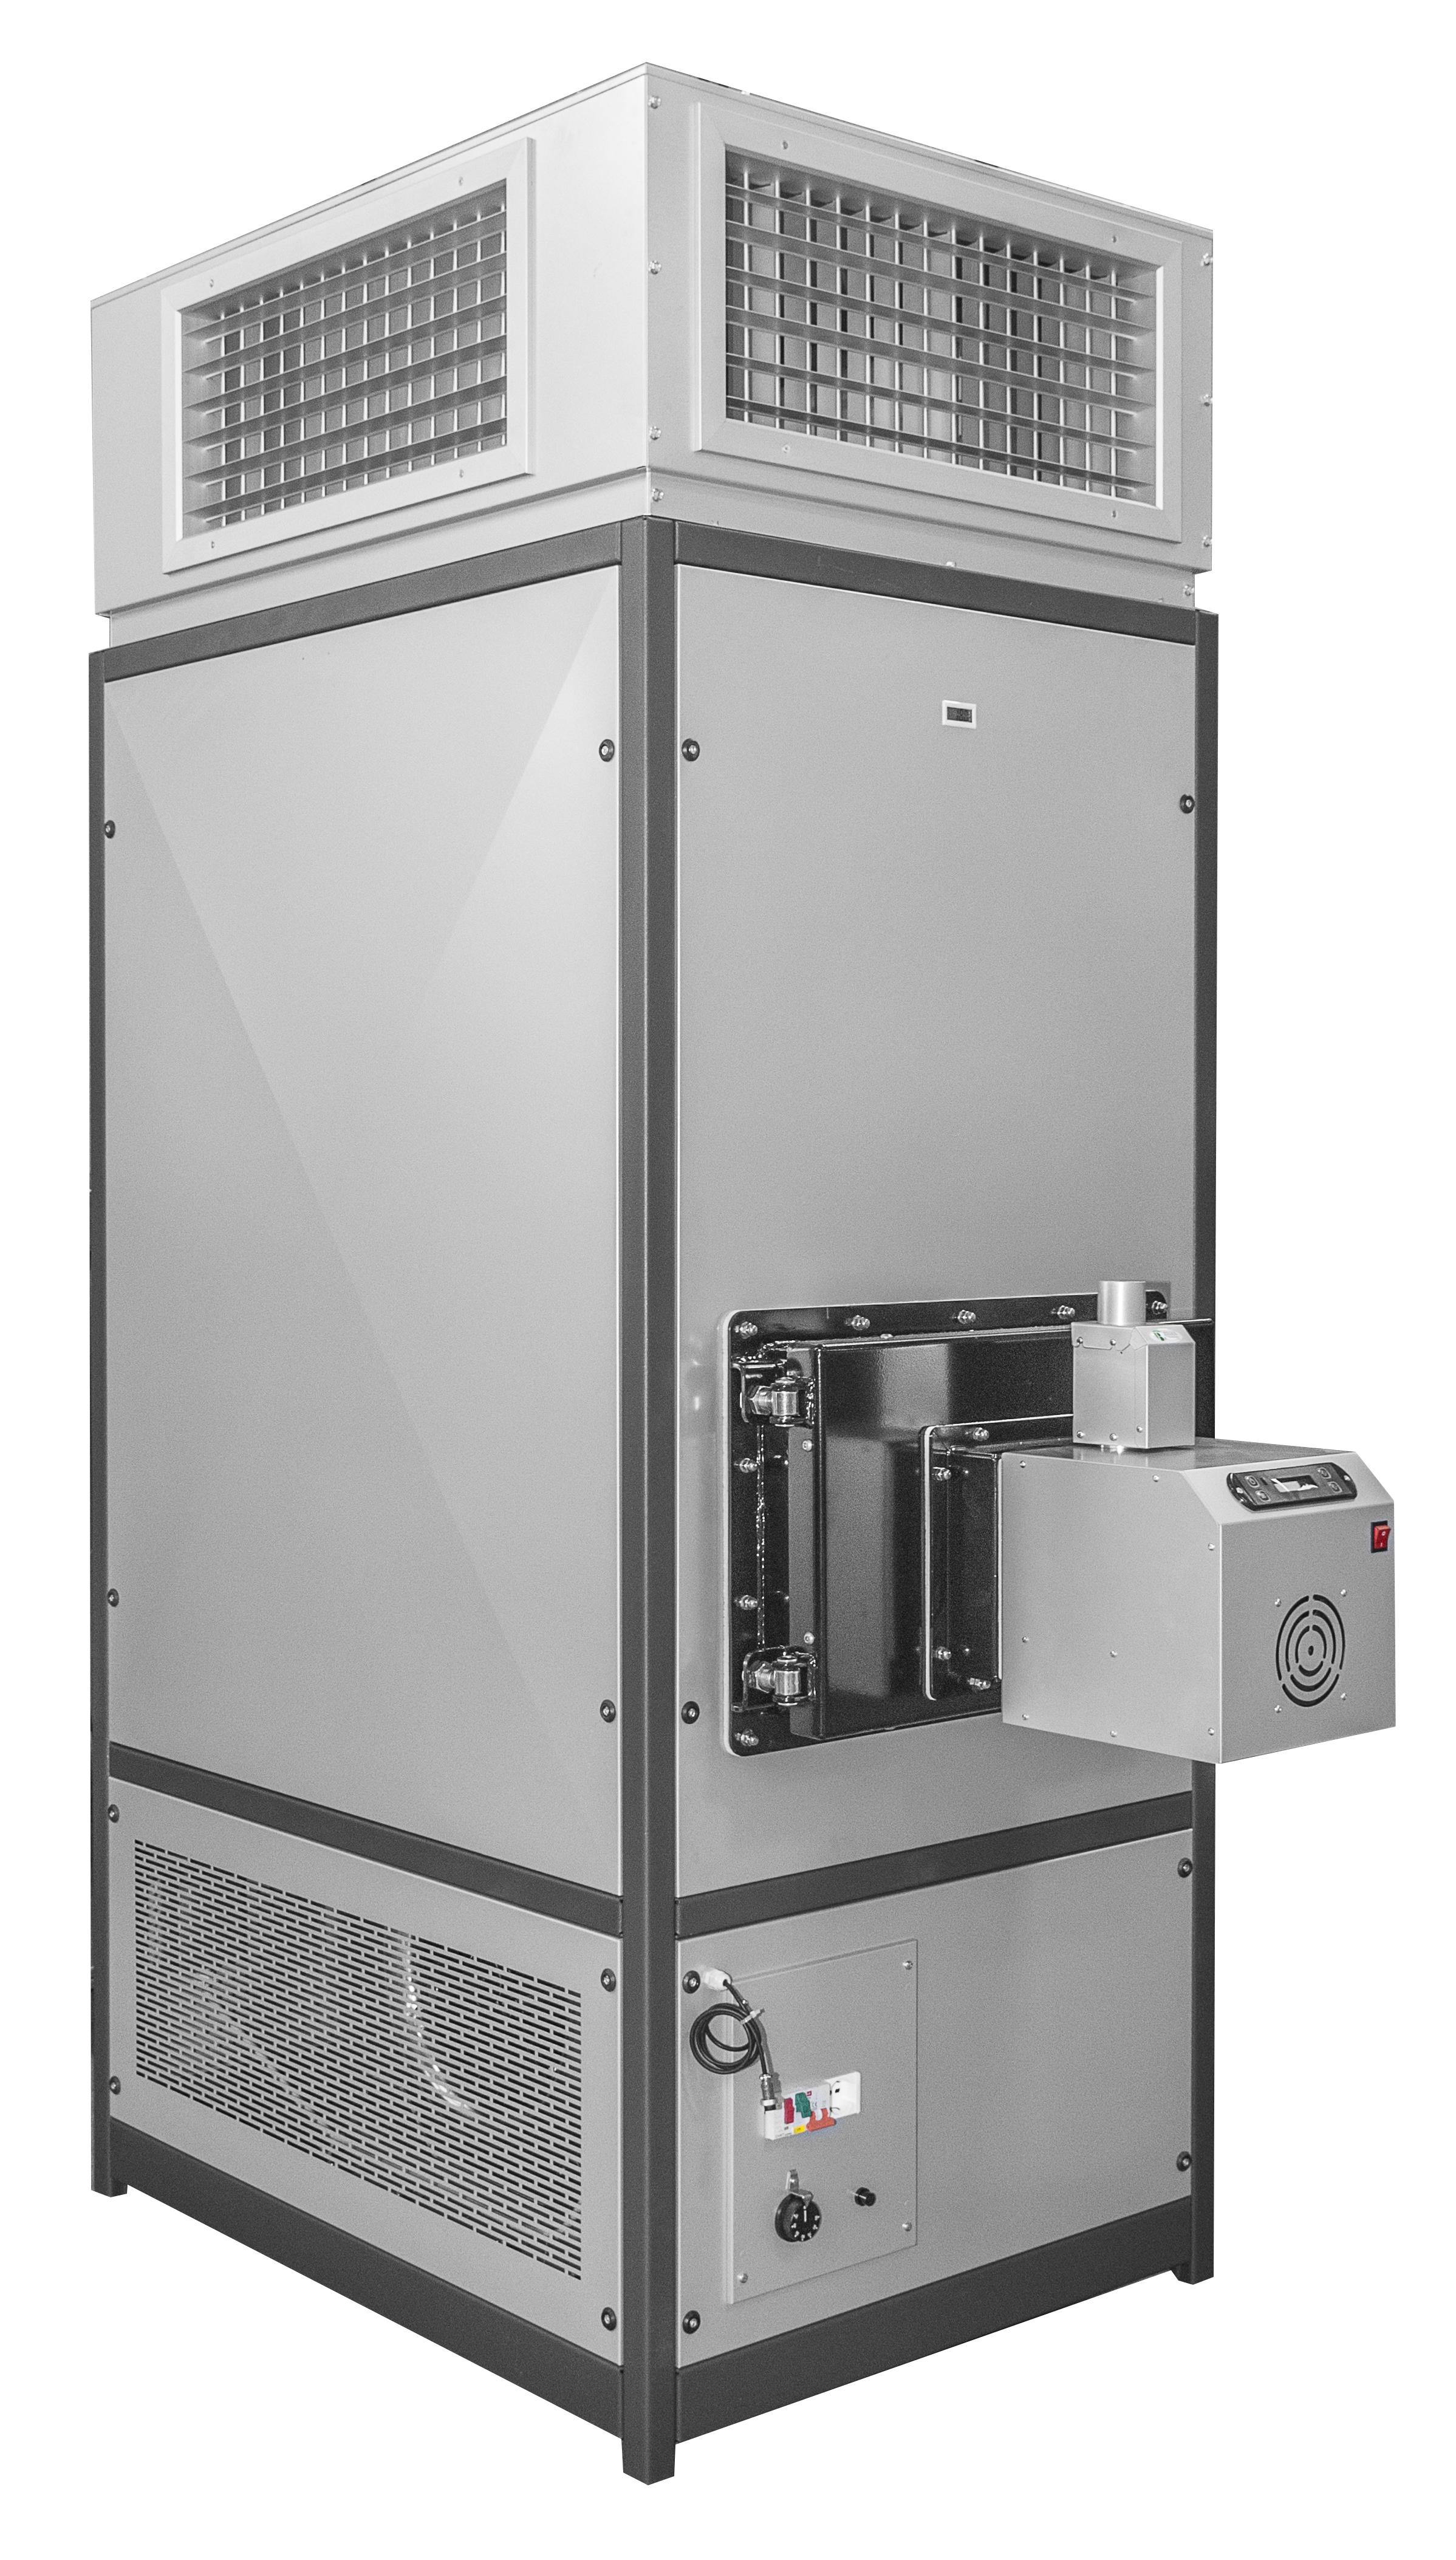 B-Max Hot air generator